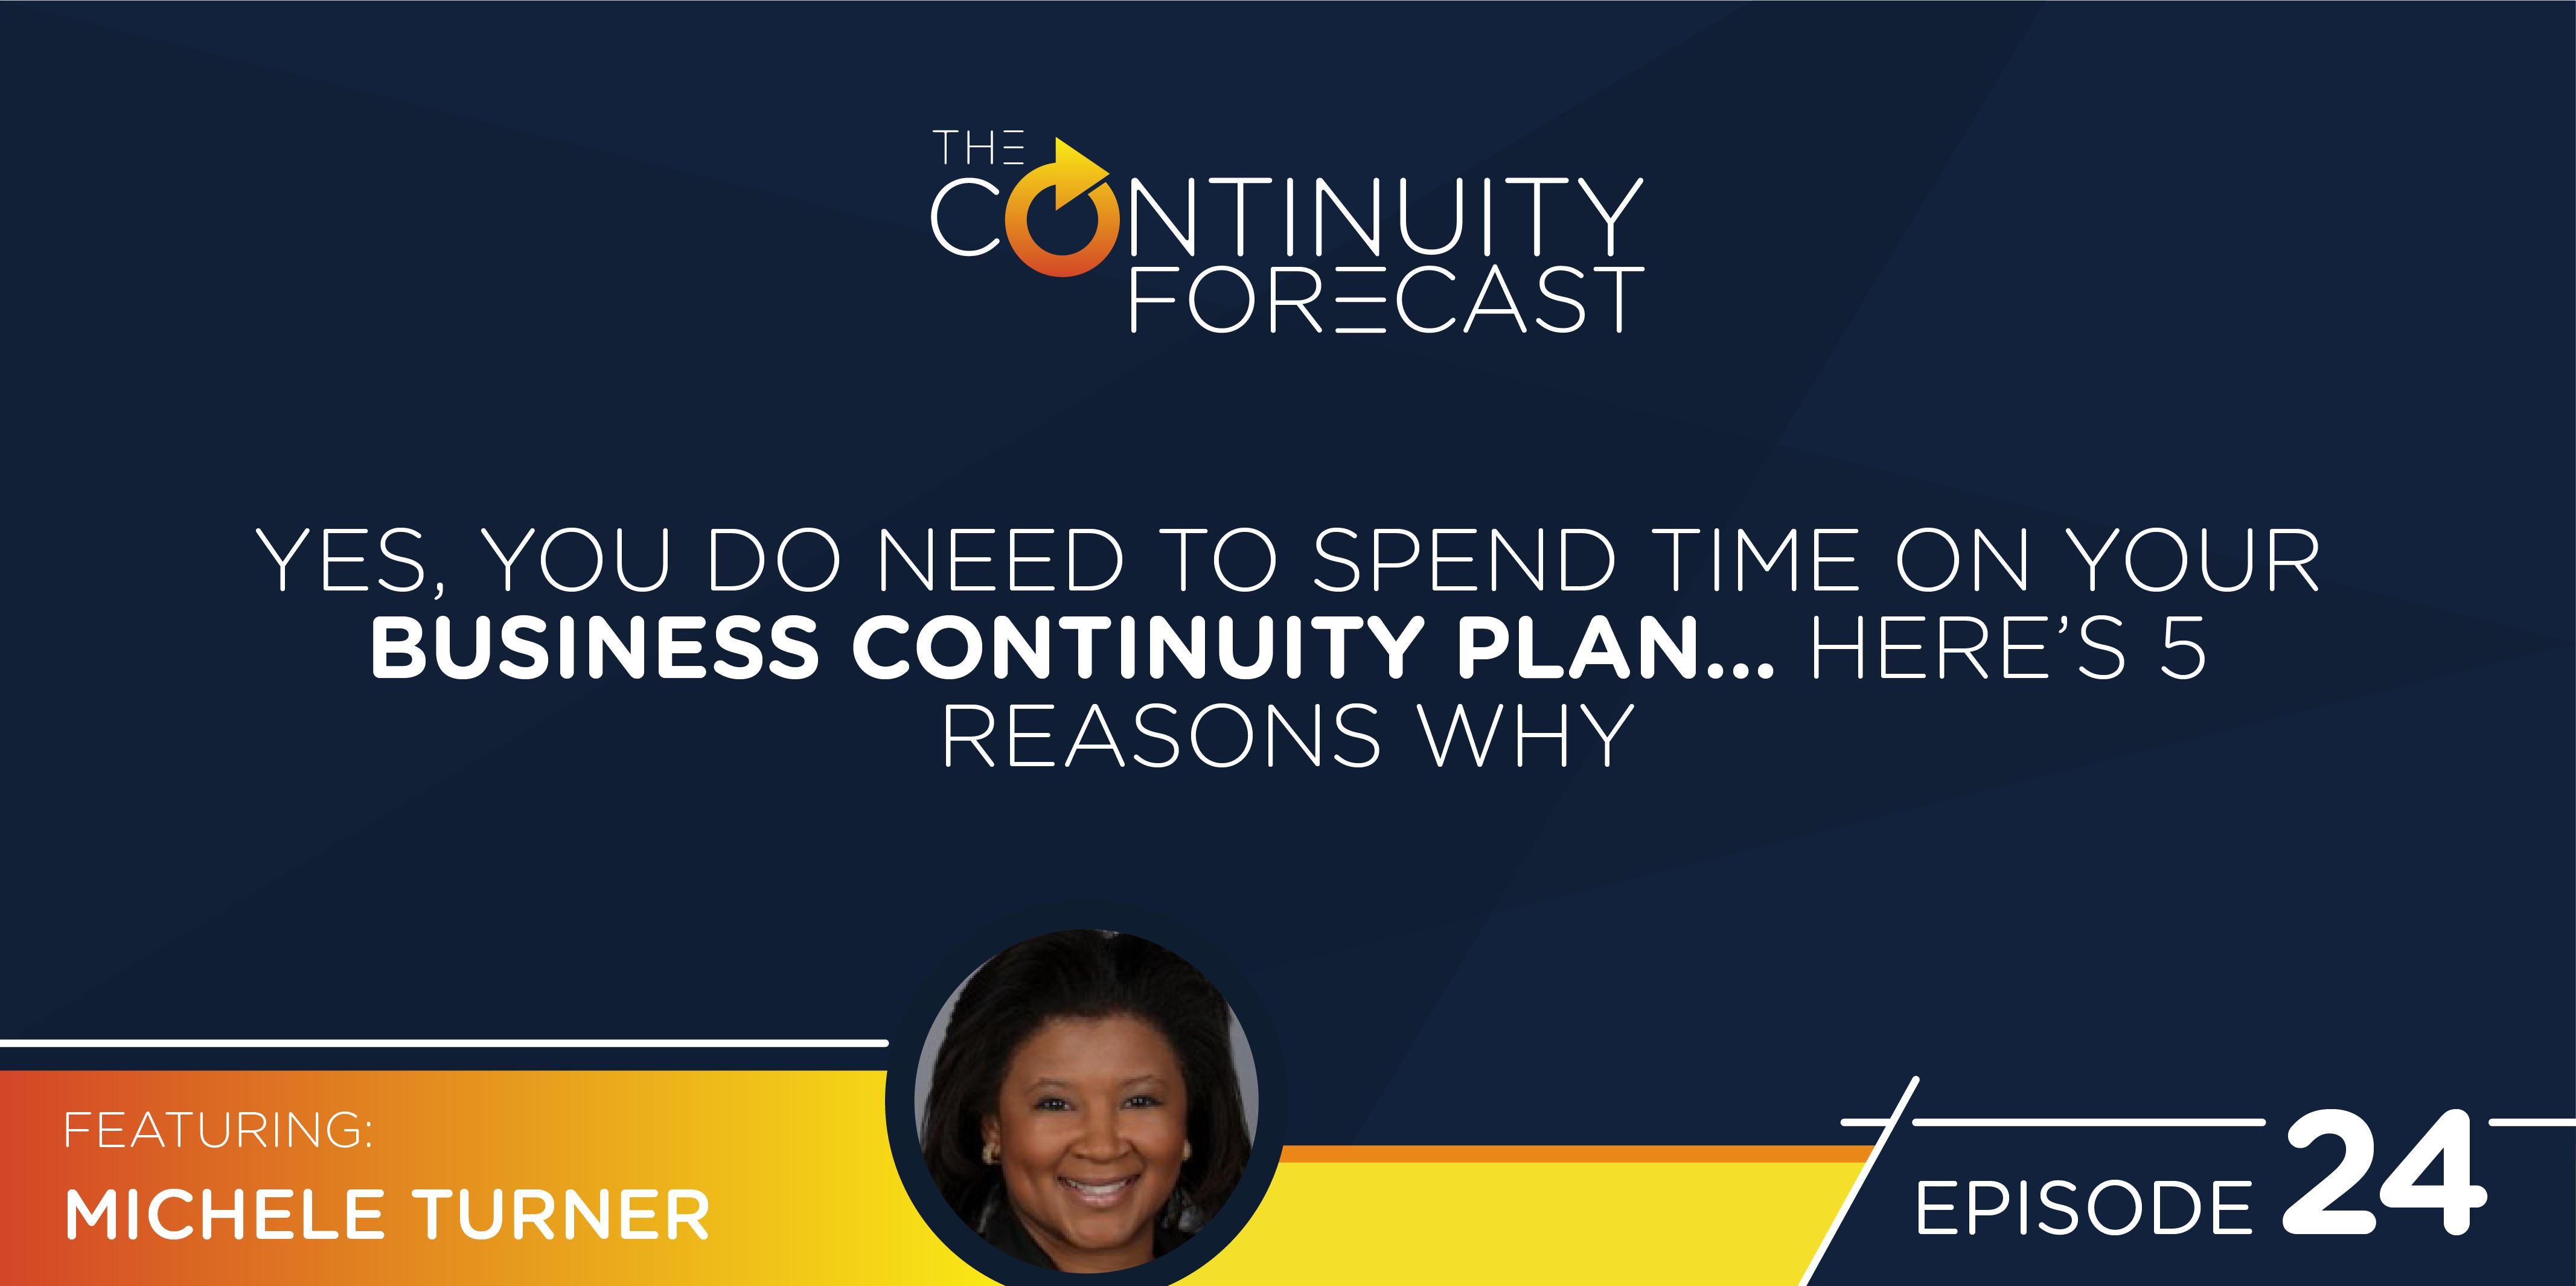 Continuity Forecast Michele Turner